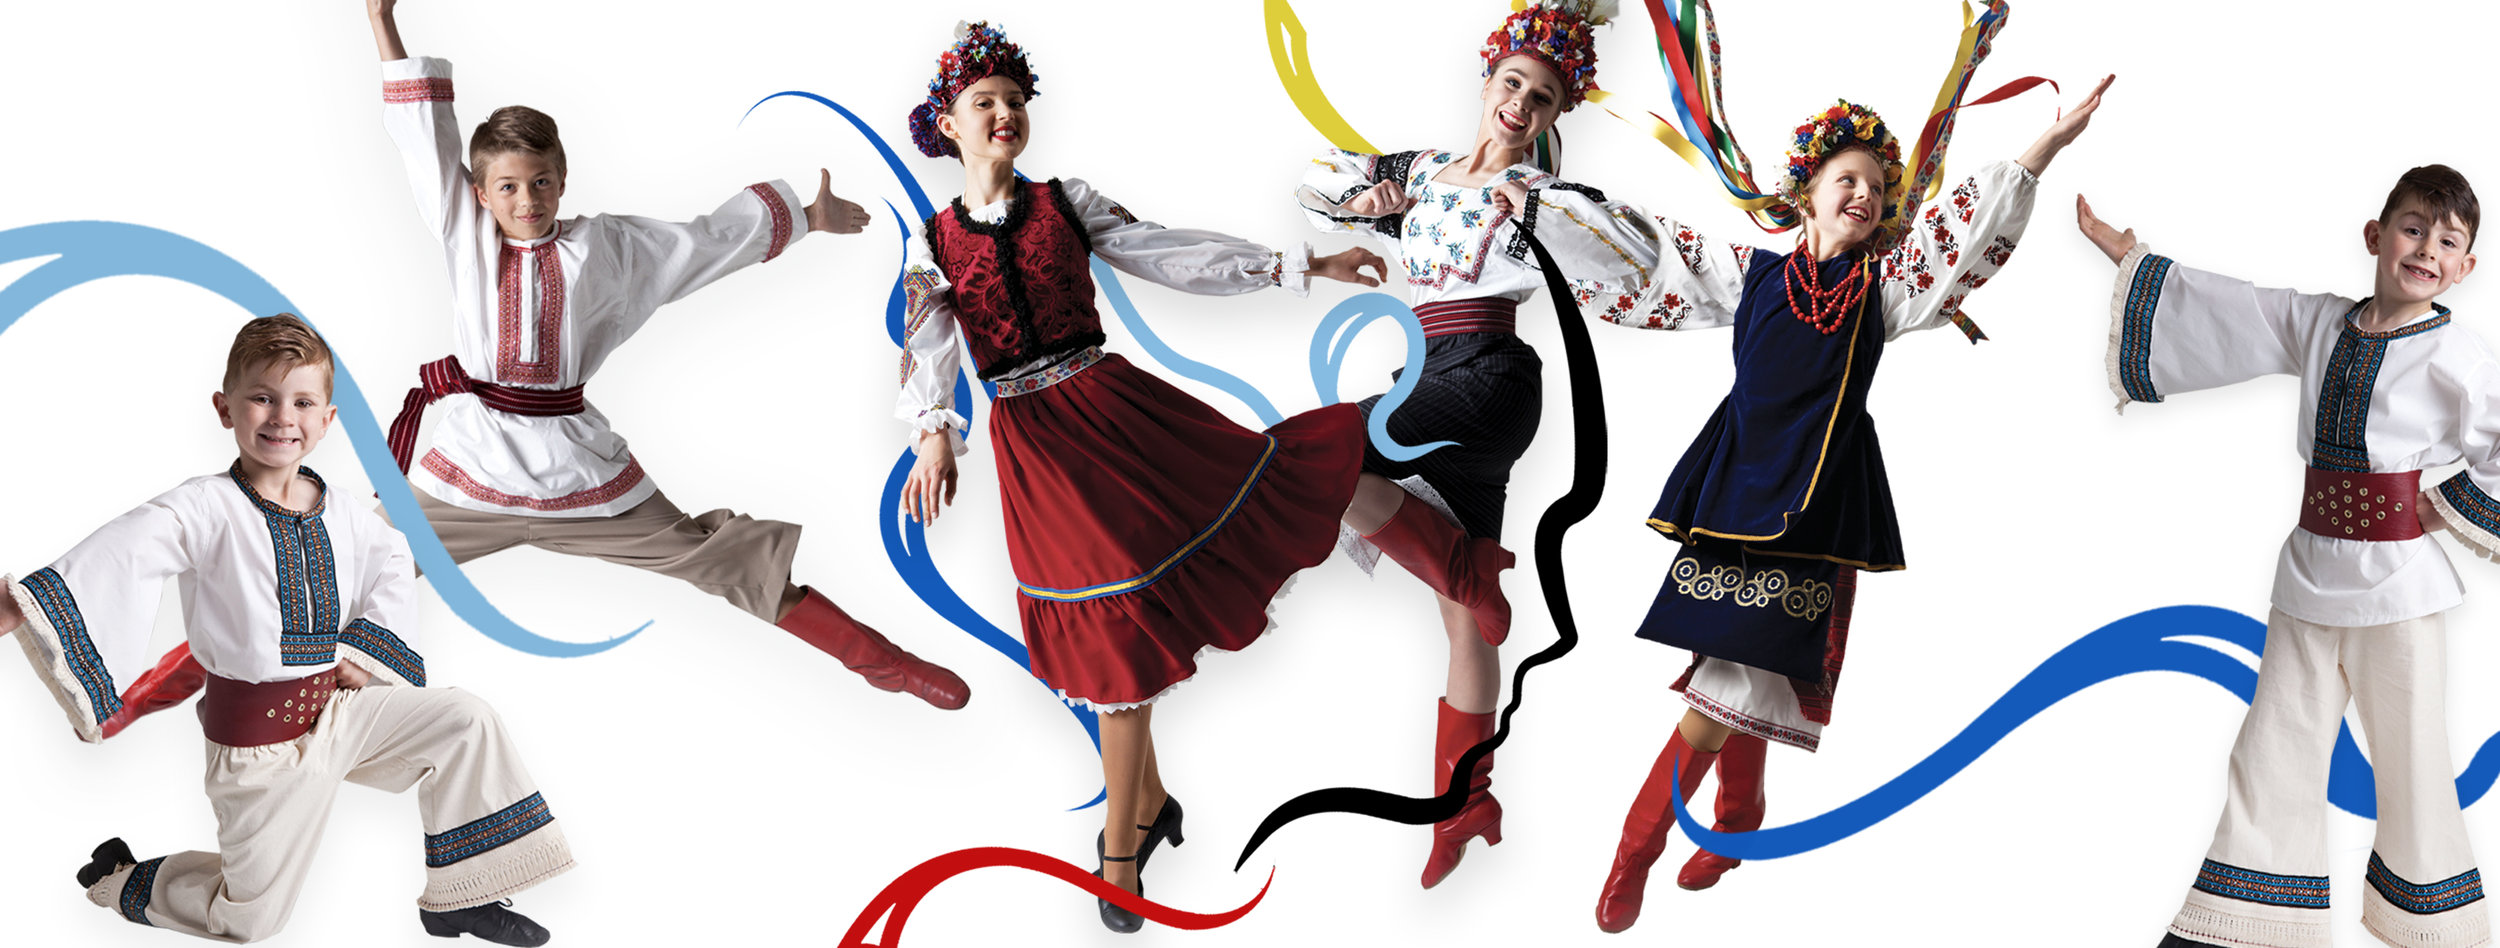 Ukrainian dance - Lehenda Core Program